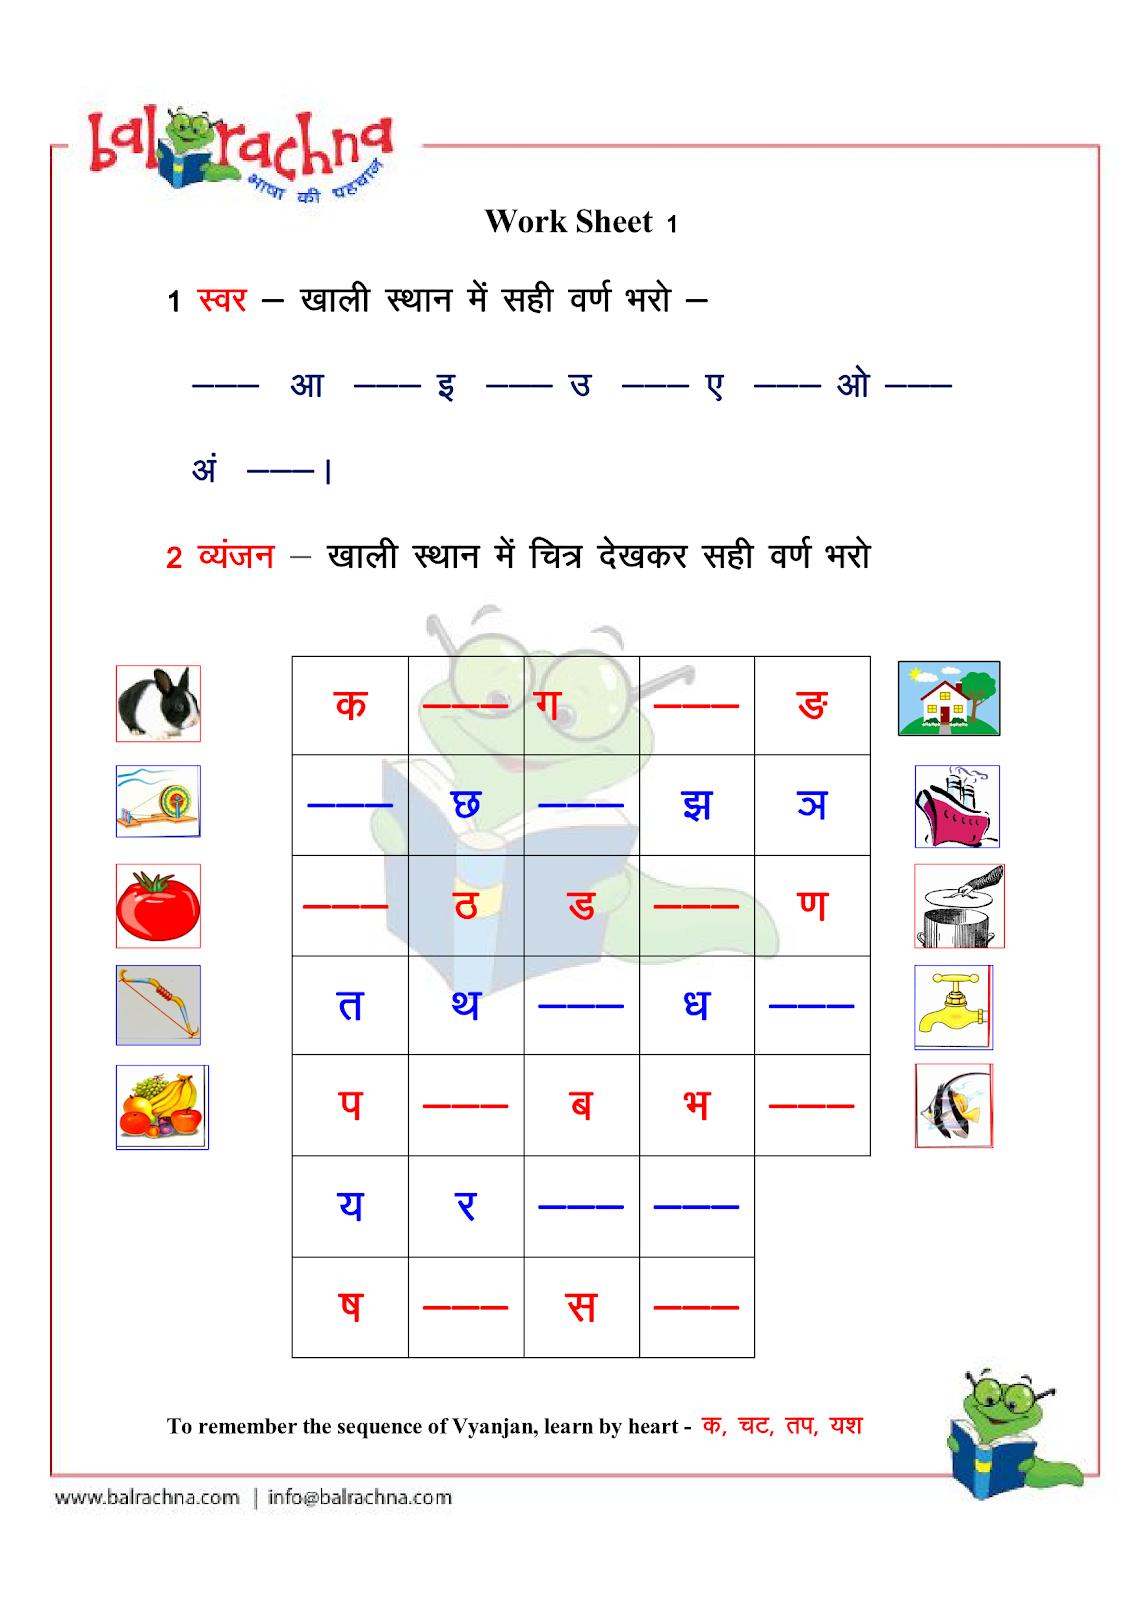 Worksheets Hindi Worksheets balrachna hindi varnamala swar vyanjan worksheets 1 i am sure they would be helpful to the parentstutors guide kids in their learning process